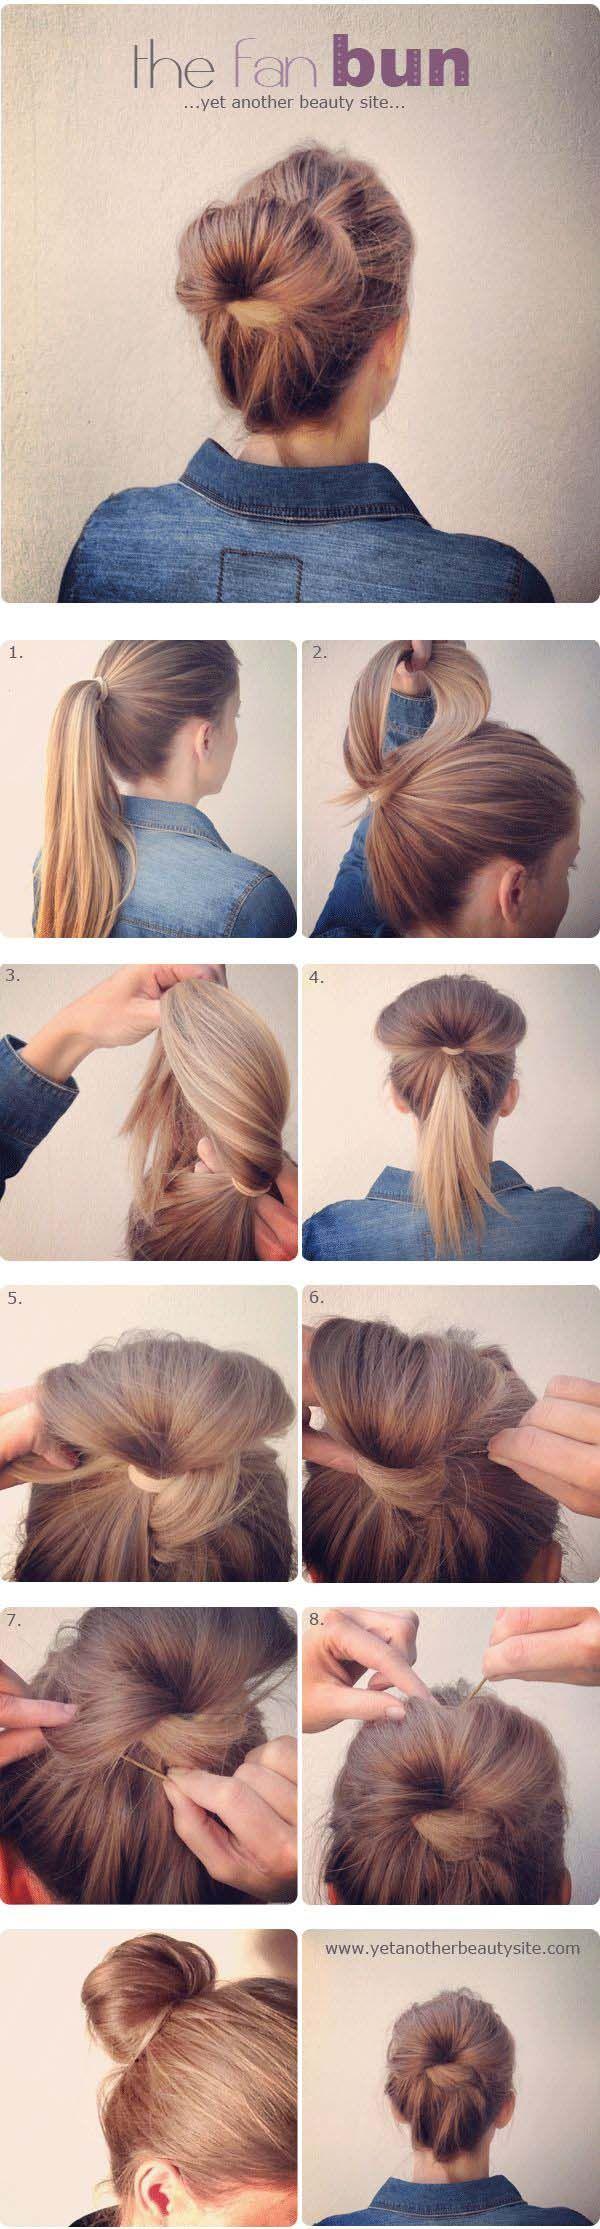 Tutoriales para peinados